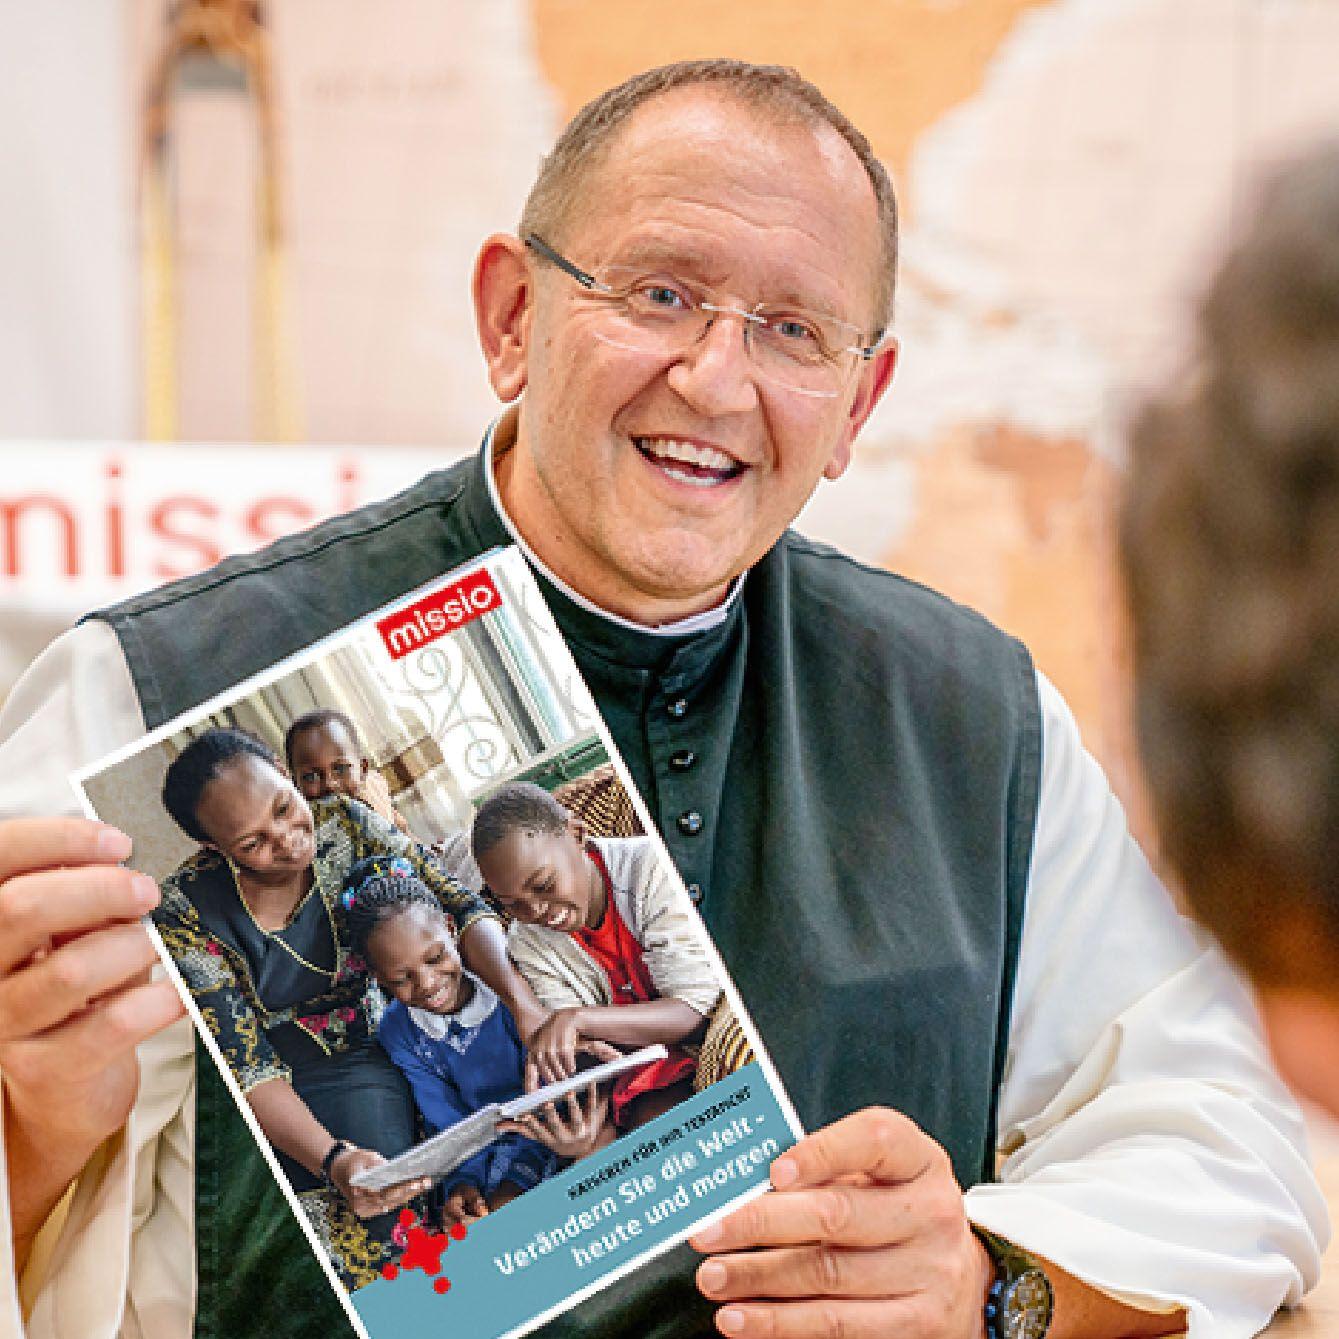 Pater Karl Wallner mit dem Missio-Testamentsratgeber